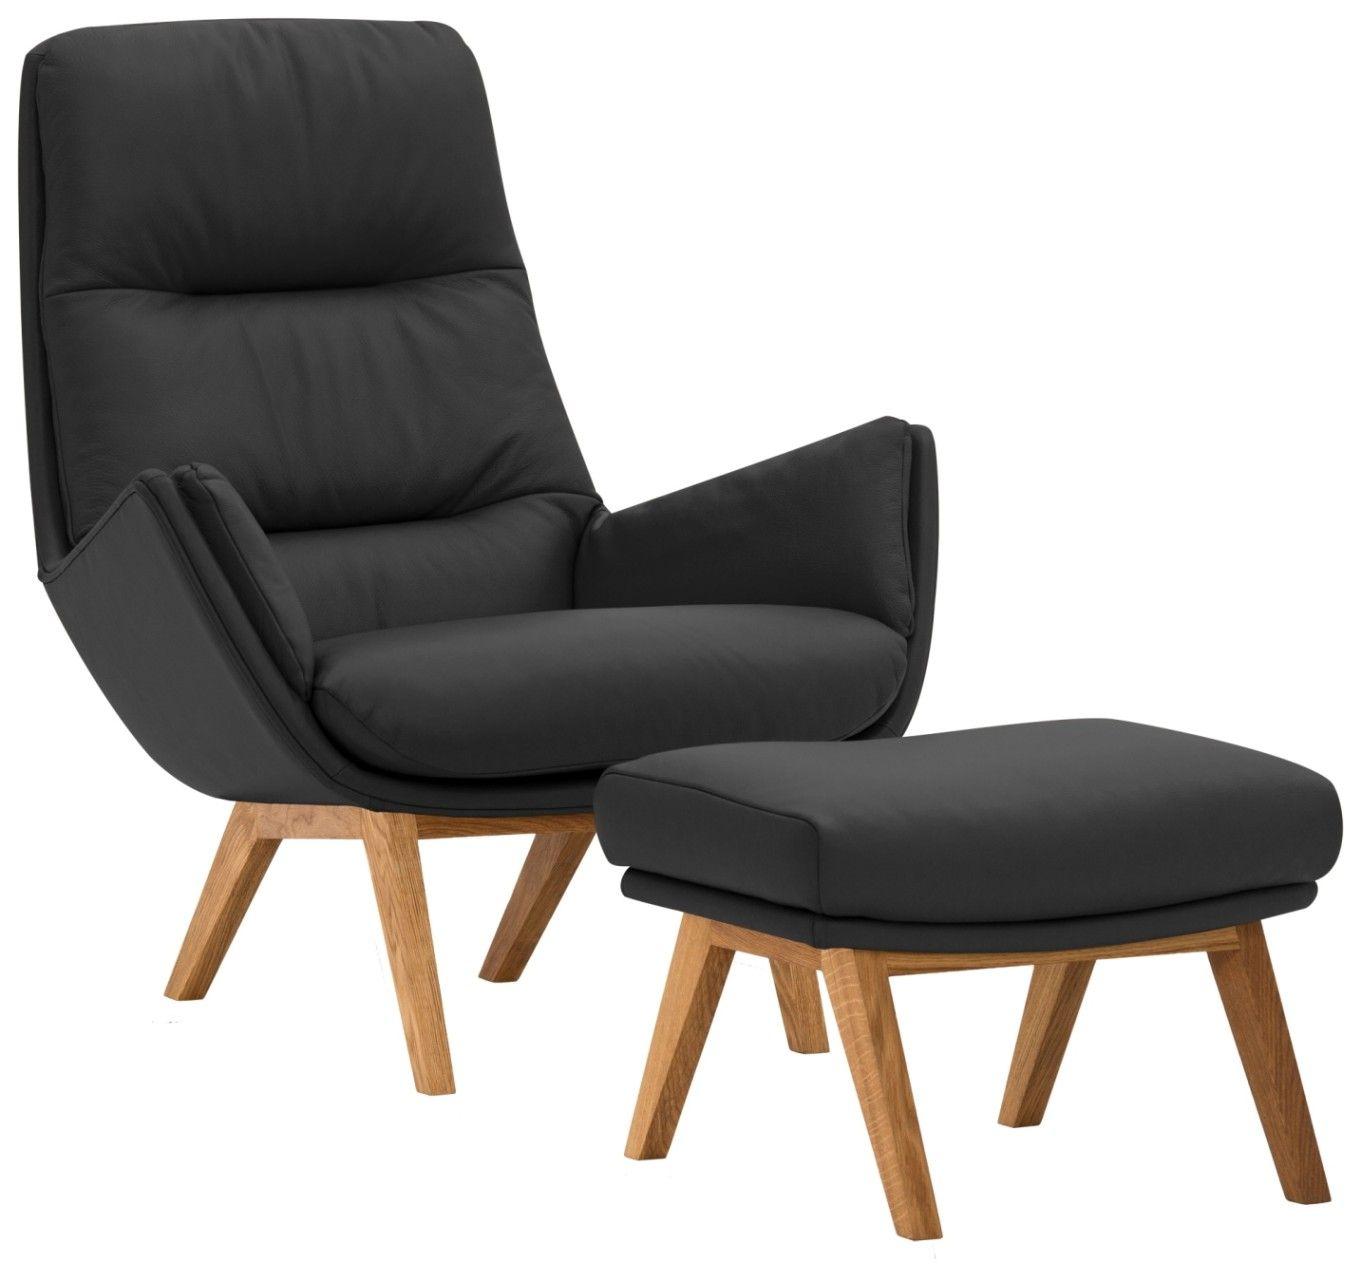 Full Size of Ikea Relaxsessel Garten Leder Kinder Muren Strandmon Gebraucht Sessel Elektrisch Mit Hocker Ohrensessel Genial Schlafzimmer Betten Bei Sofa Schlaffunktion Wohnzimmer Ikea Relaxsessel